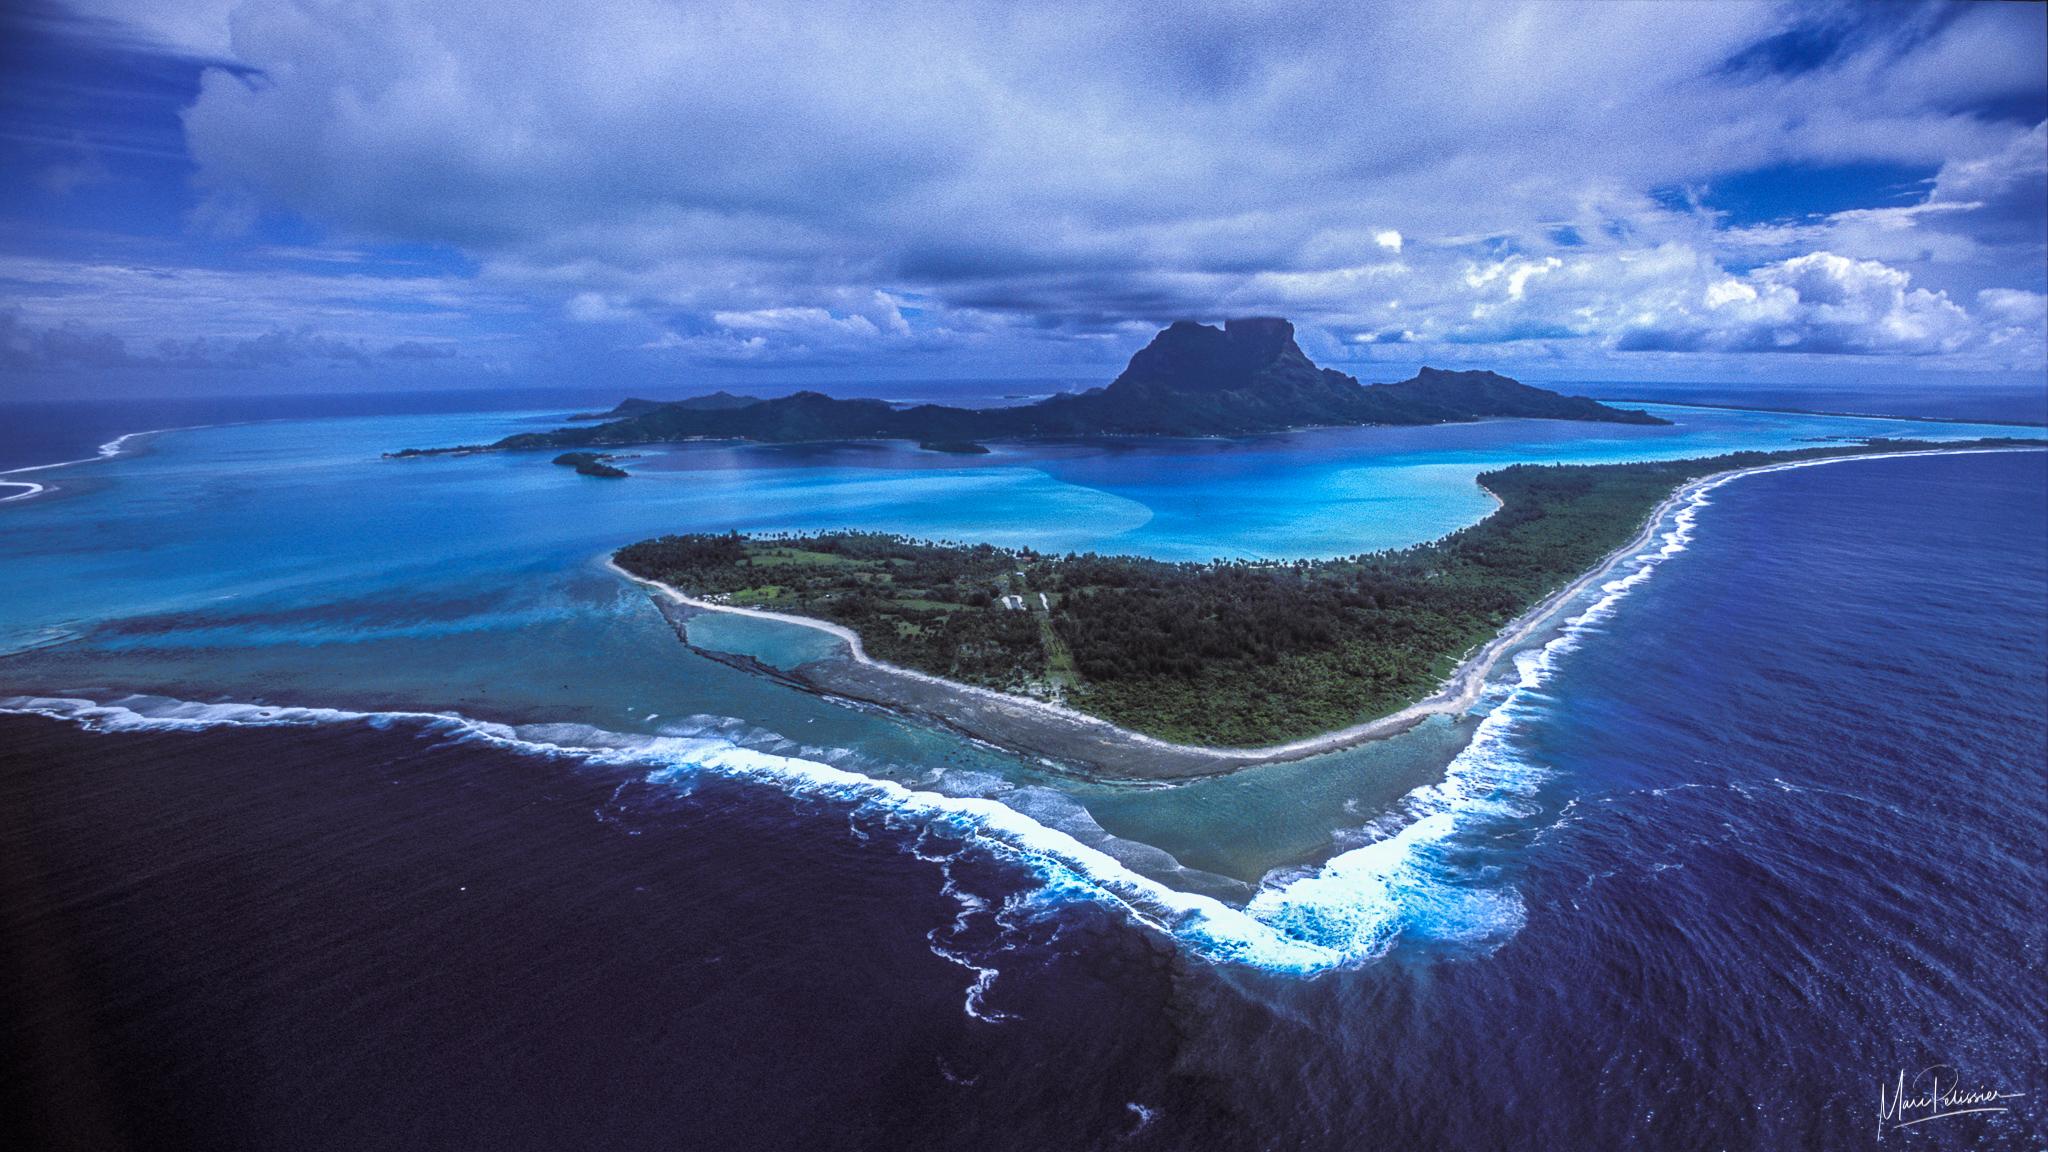 The Matira heart, French Polynesia